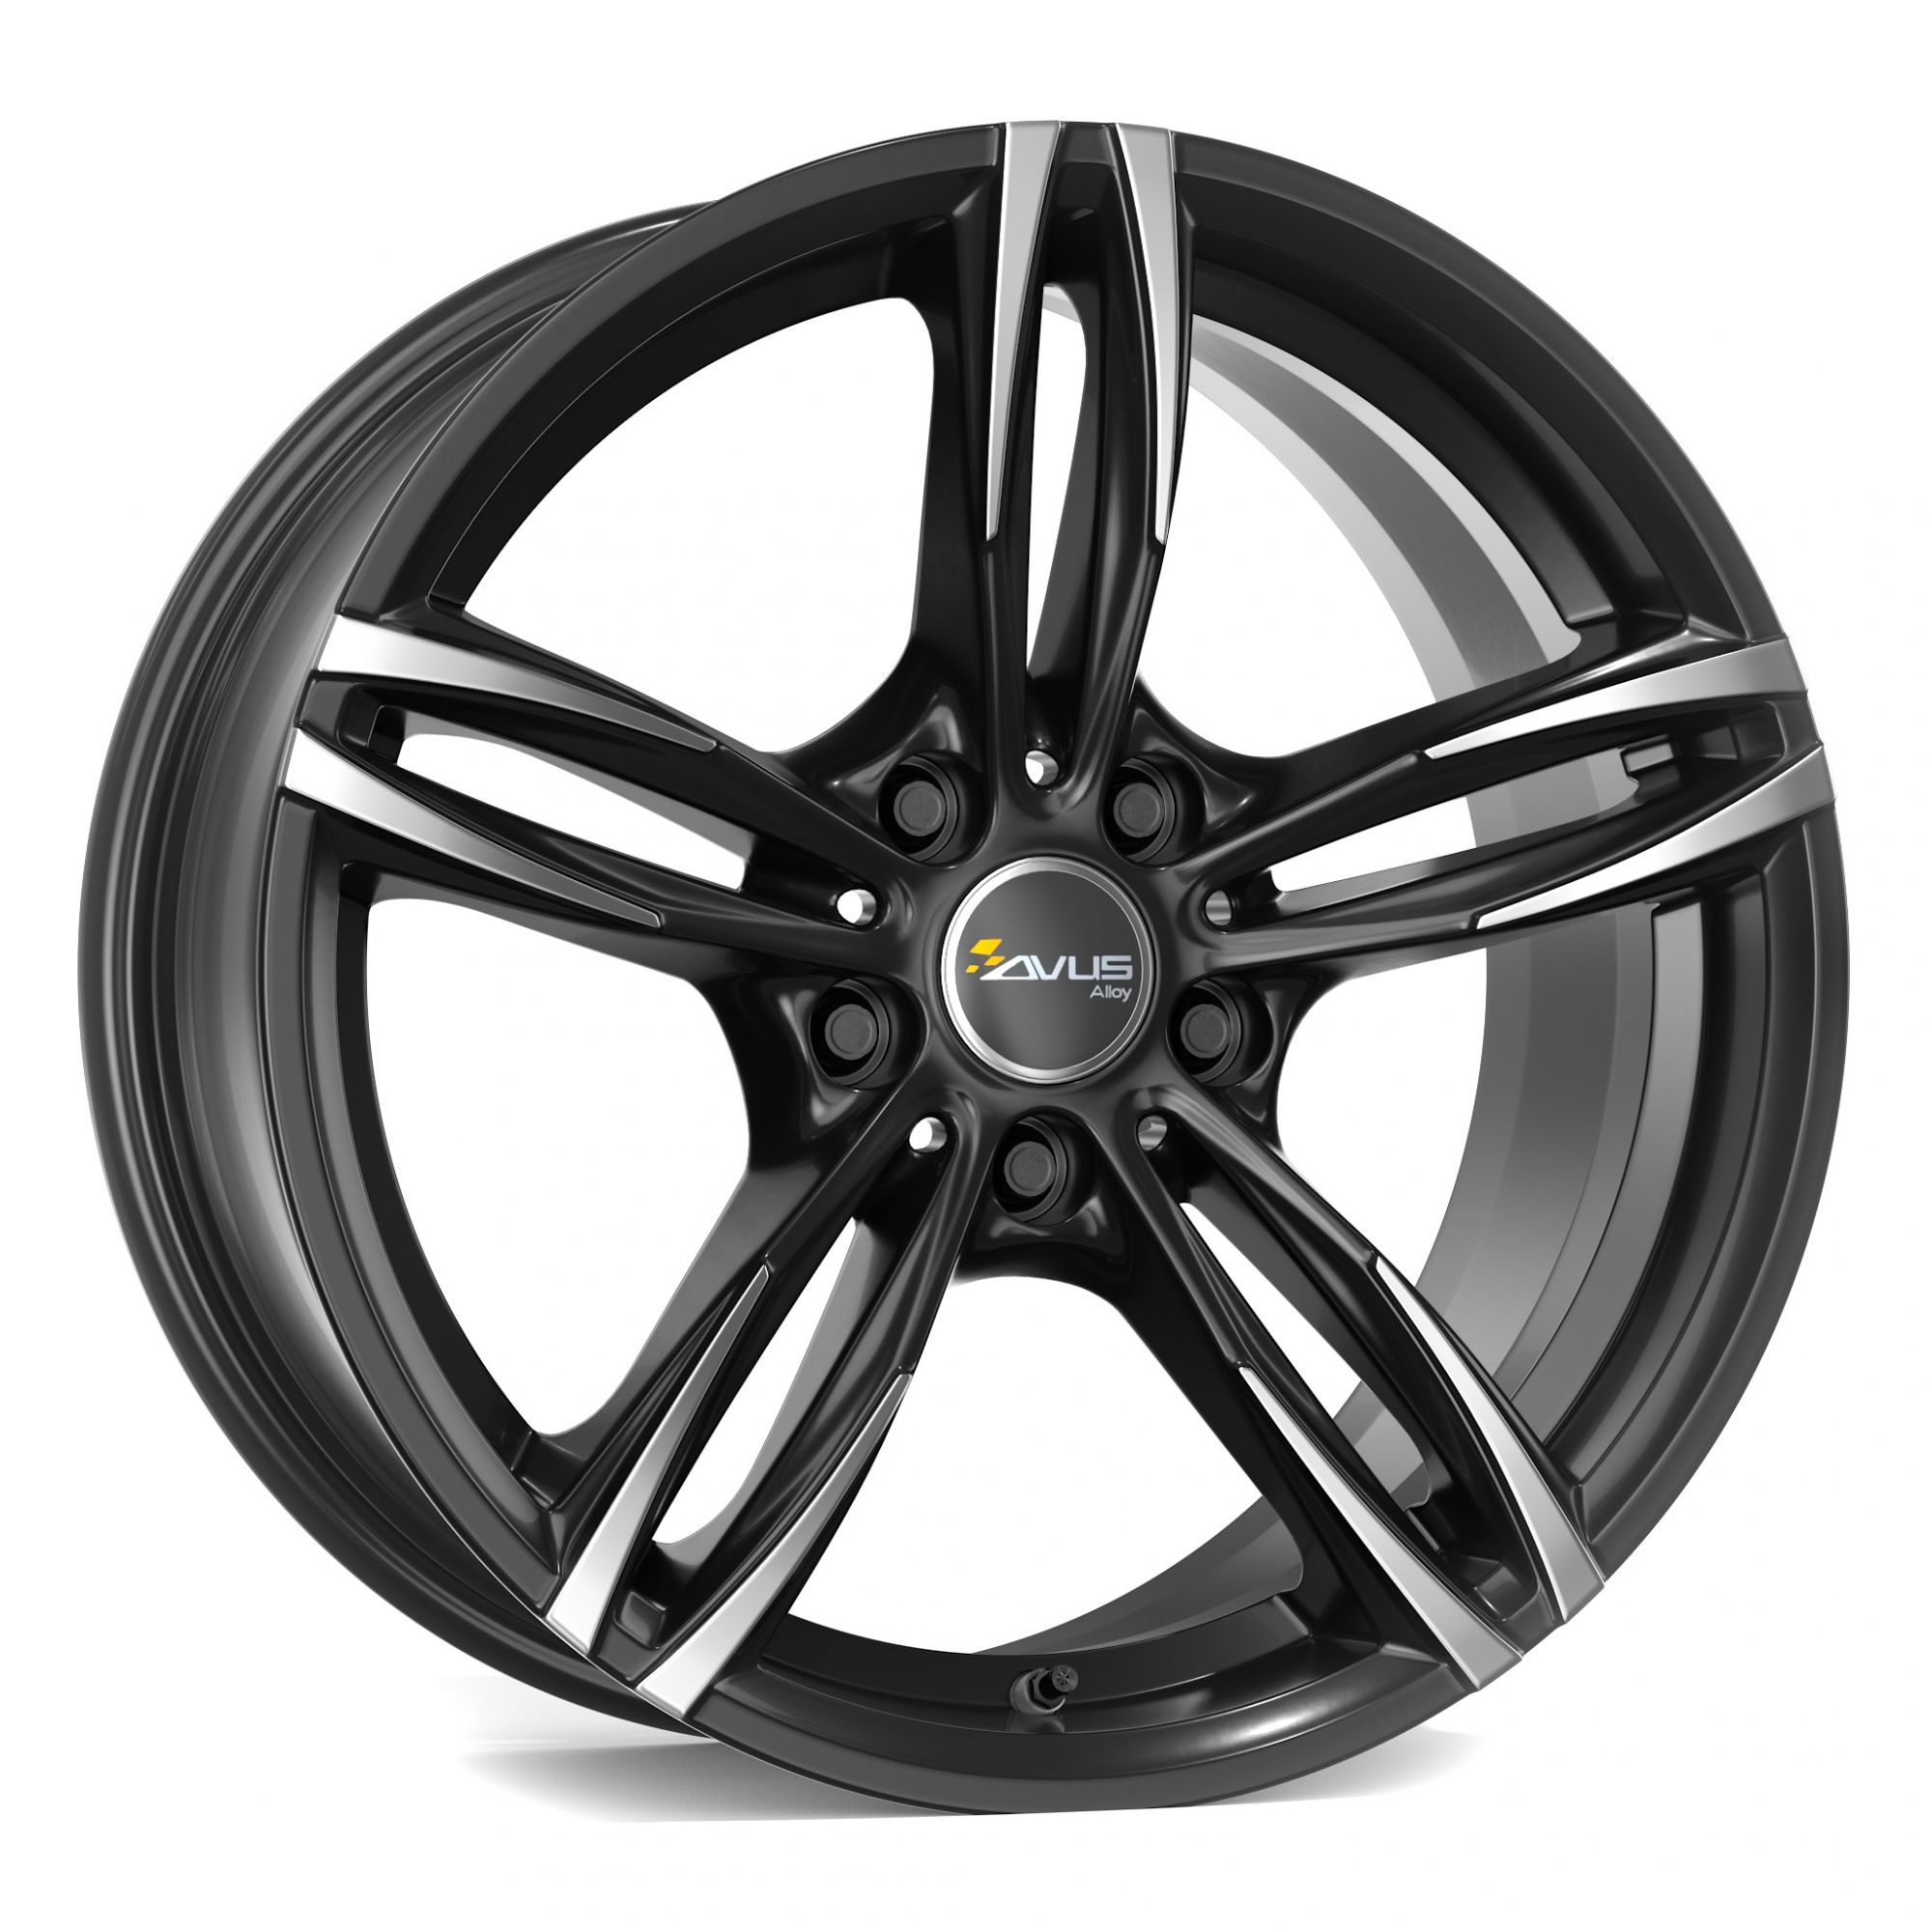 avus racing ac mb3 felgen black polished schwarz mehrfarbig in 19 zoll. Black Bedroom Furniture Sets. Home Design Ideas